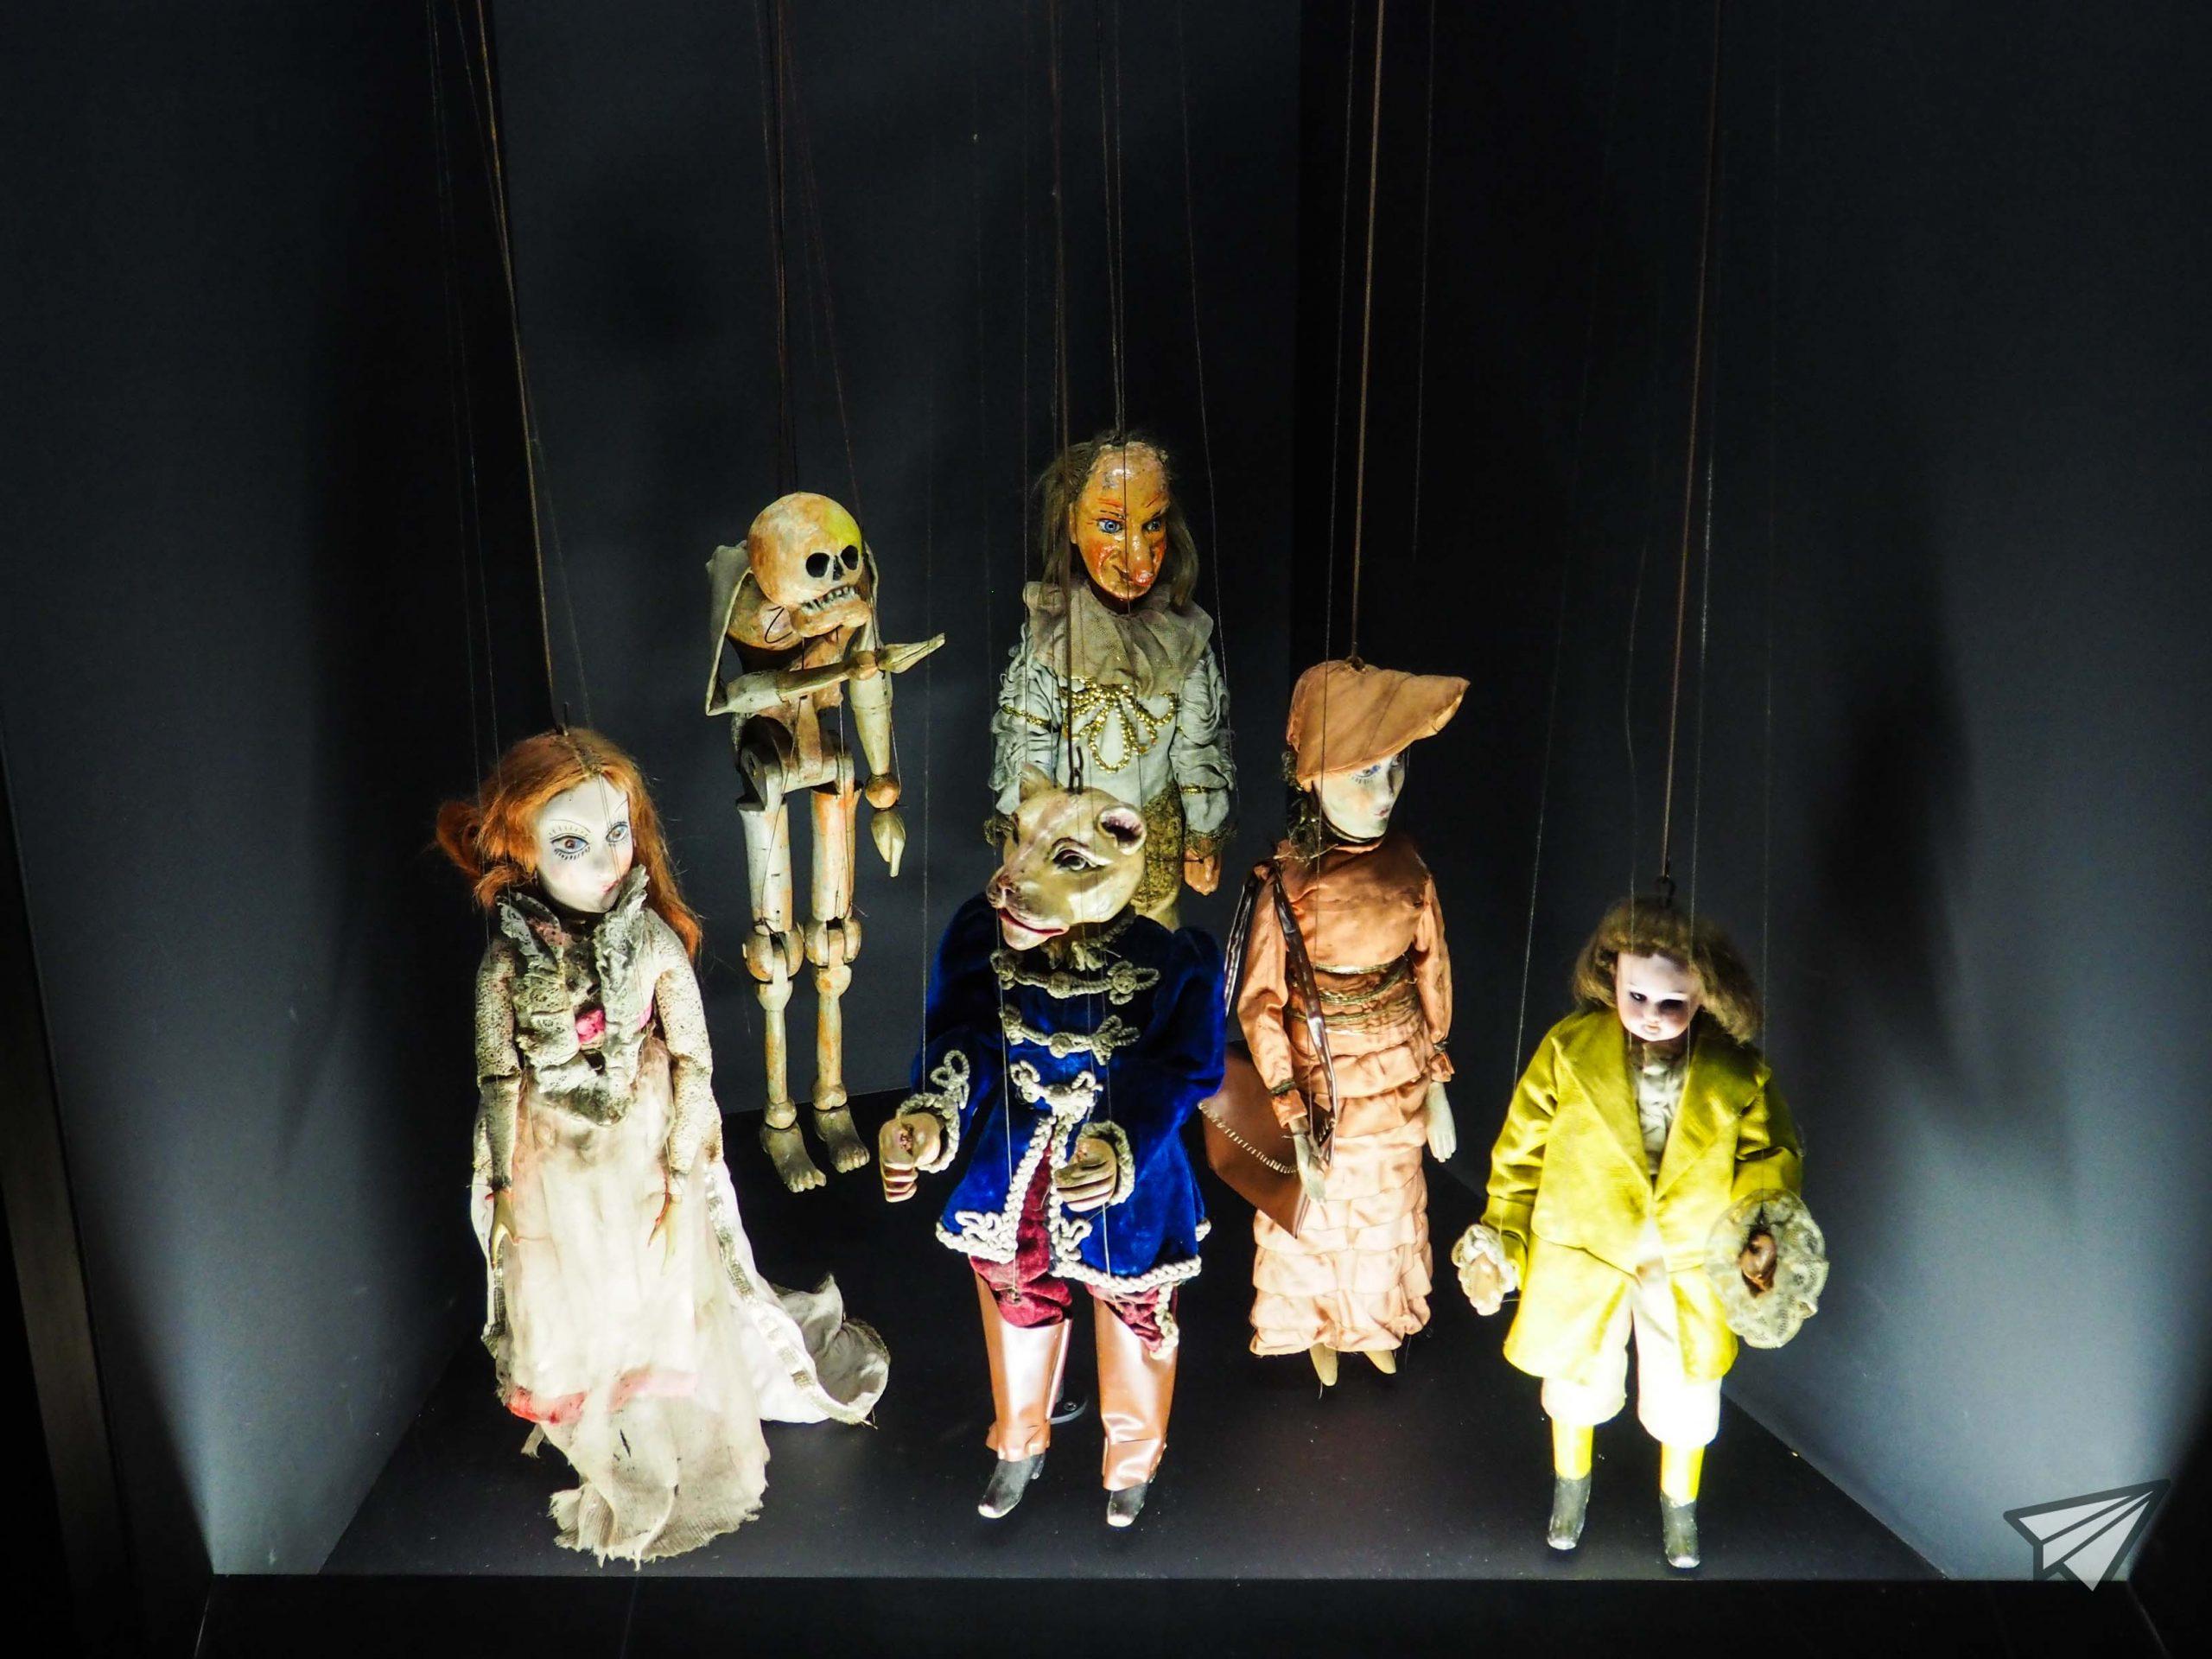 Museu da Marioneta dolls